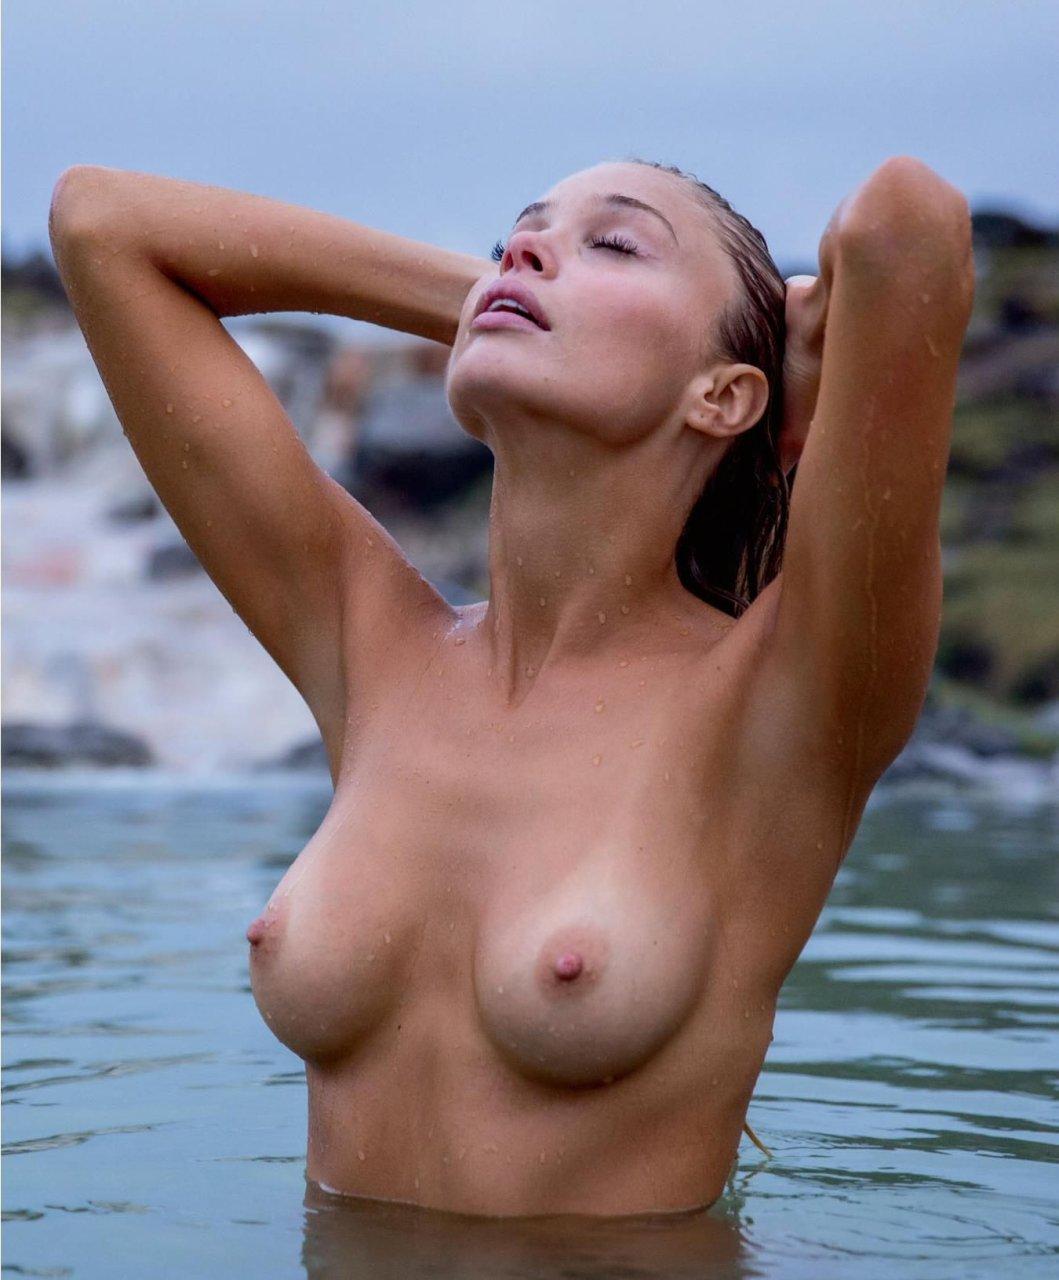 Nude girls group shower fun